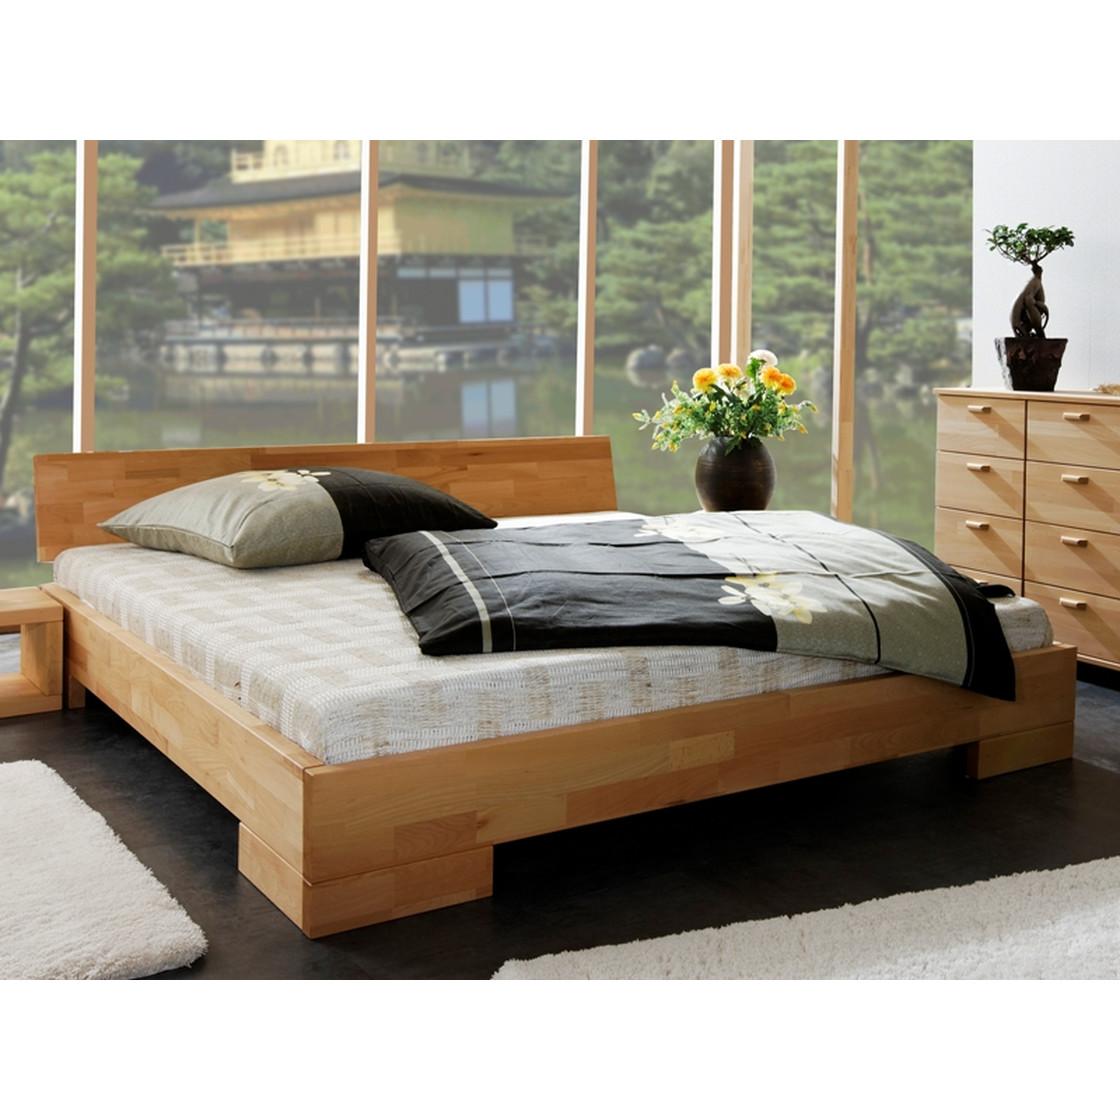 Full Size of Futonbett 100x200 Shogun Betten Bett Weiß Wohnzimmer Futonbett 100x200